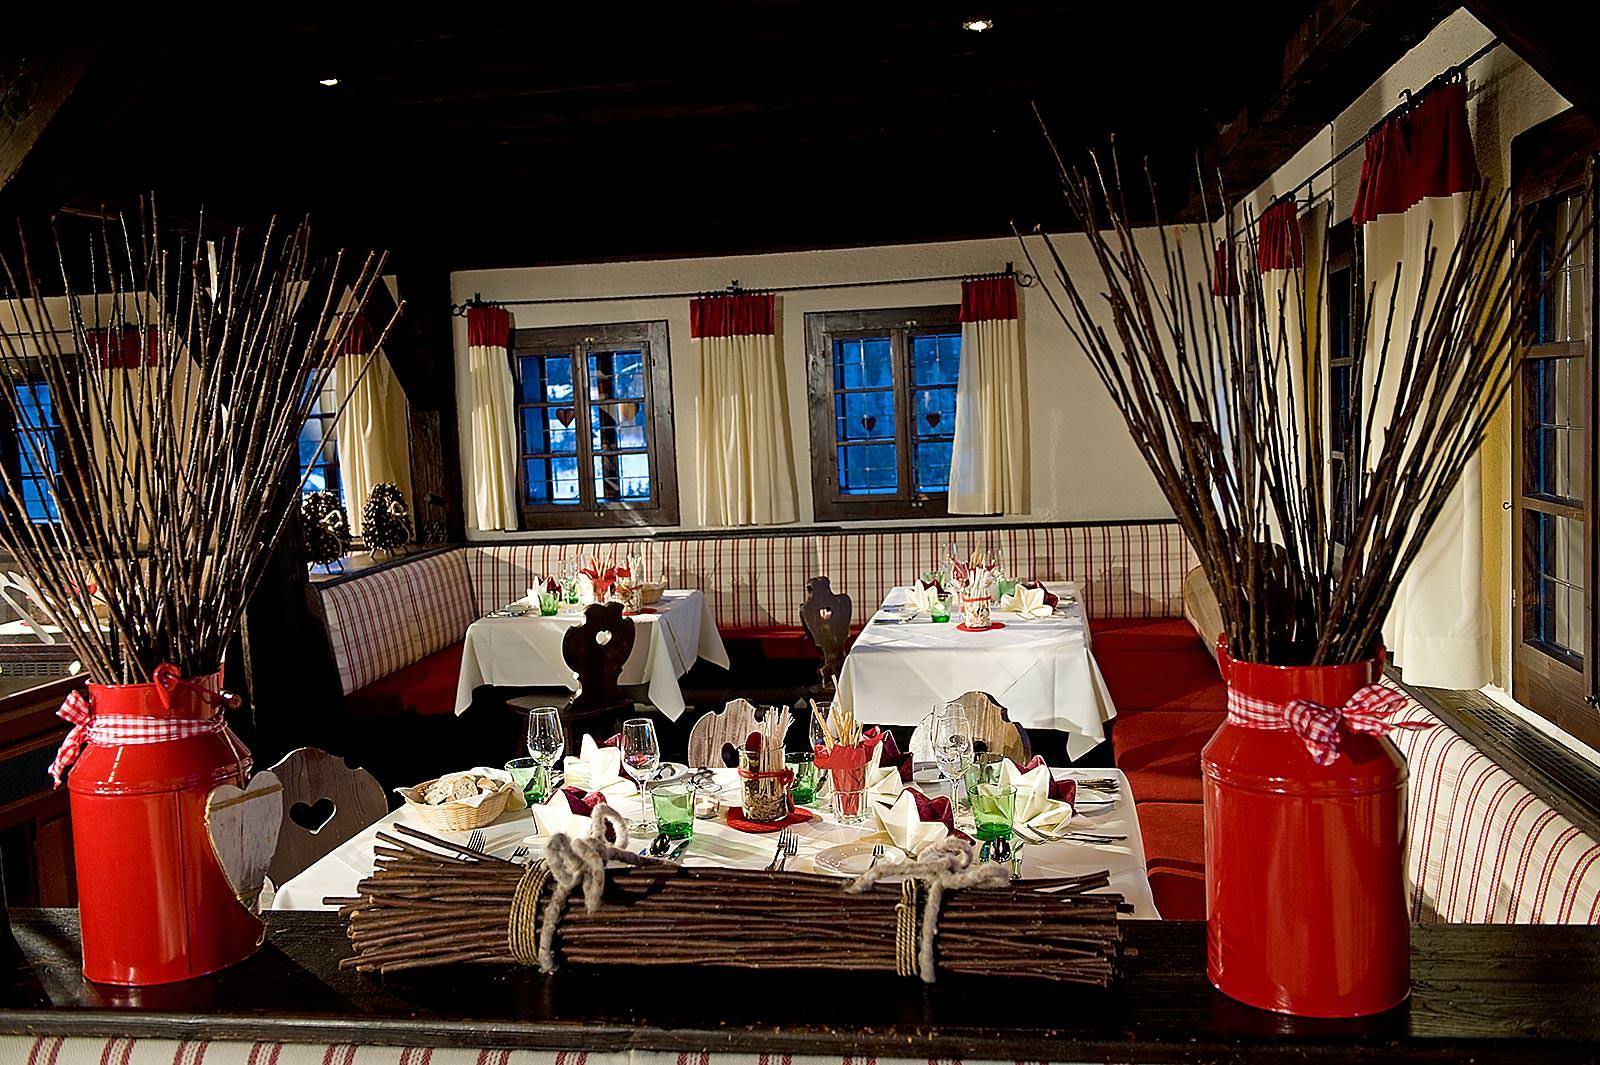 Restaurant im Feriendorf Kirchleitn (c)kirchleitn.com